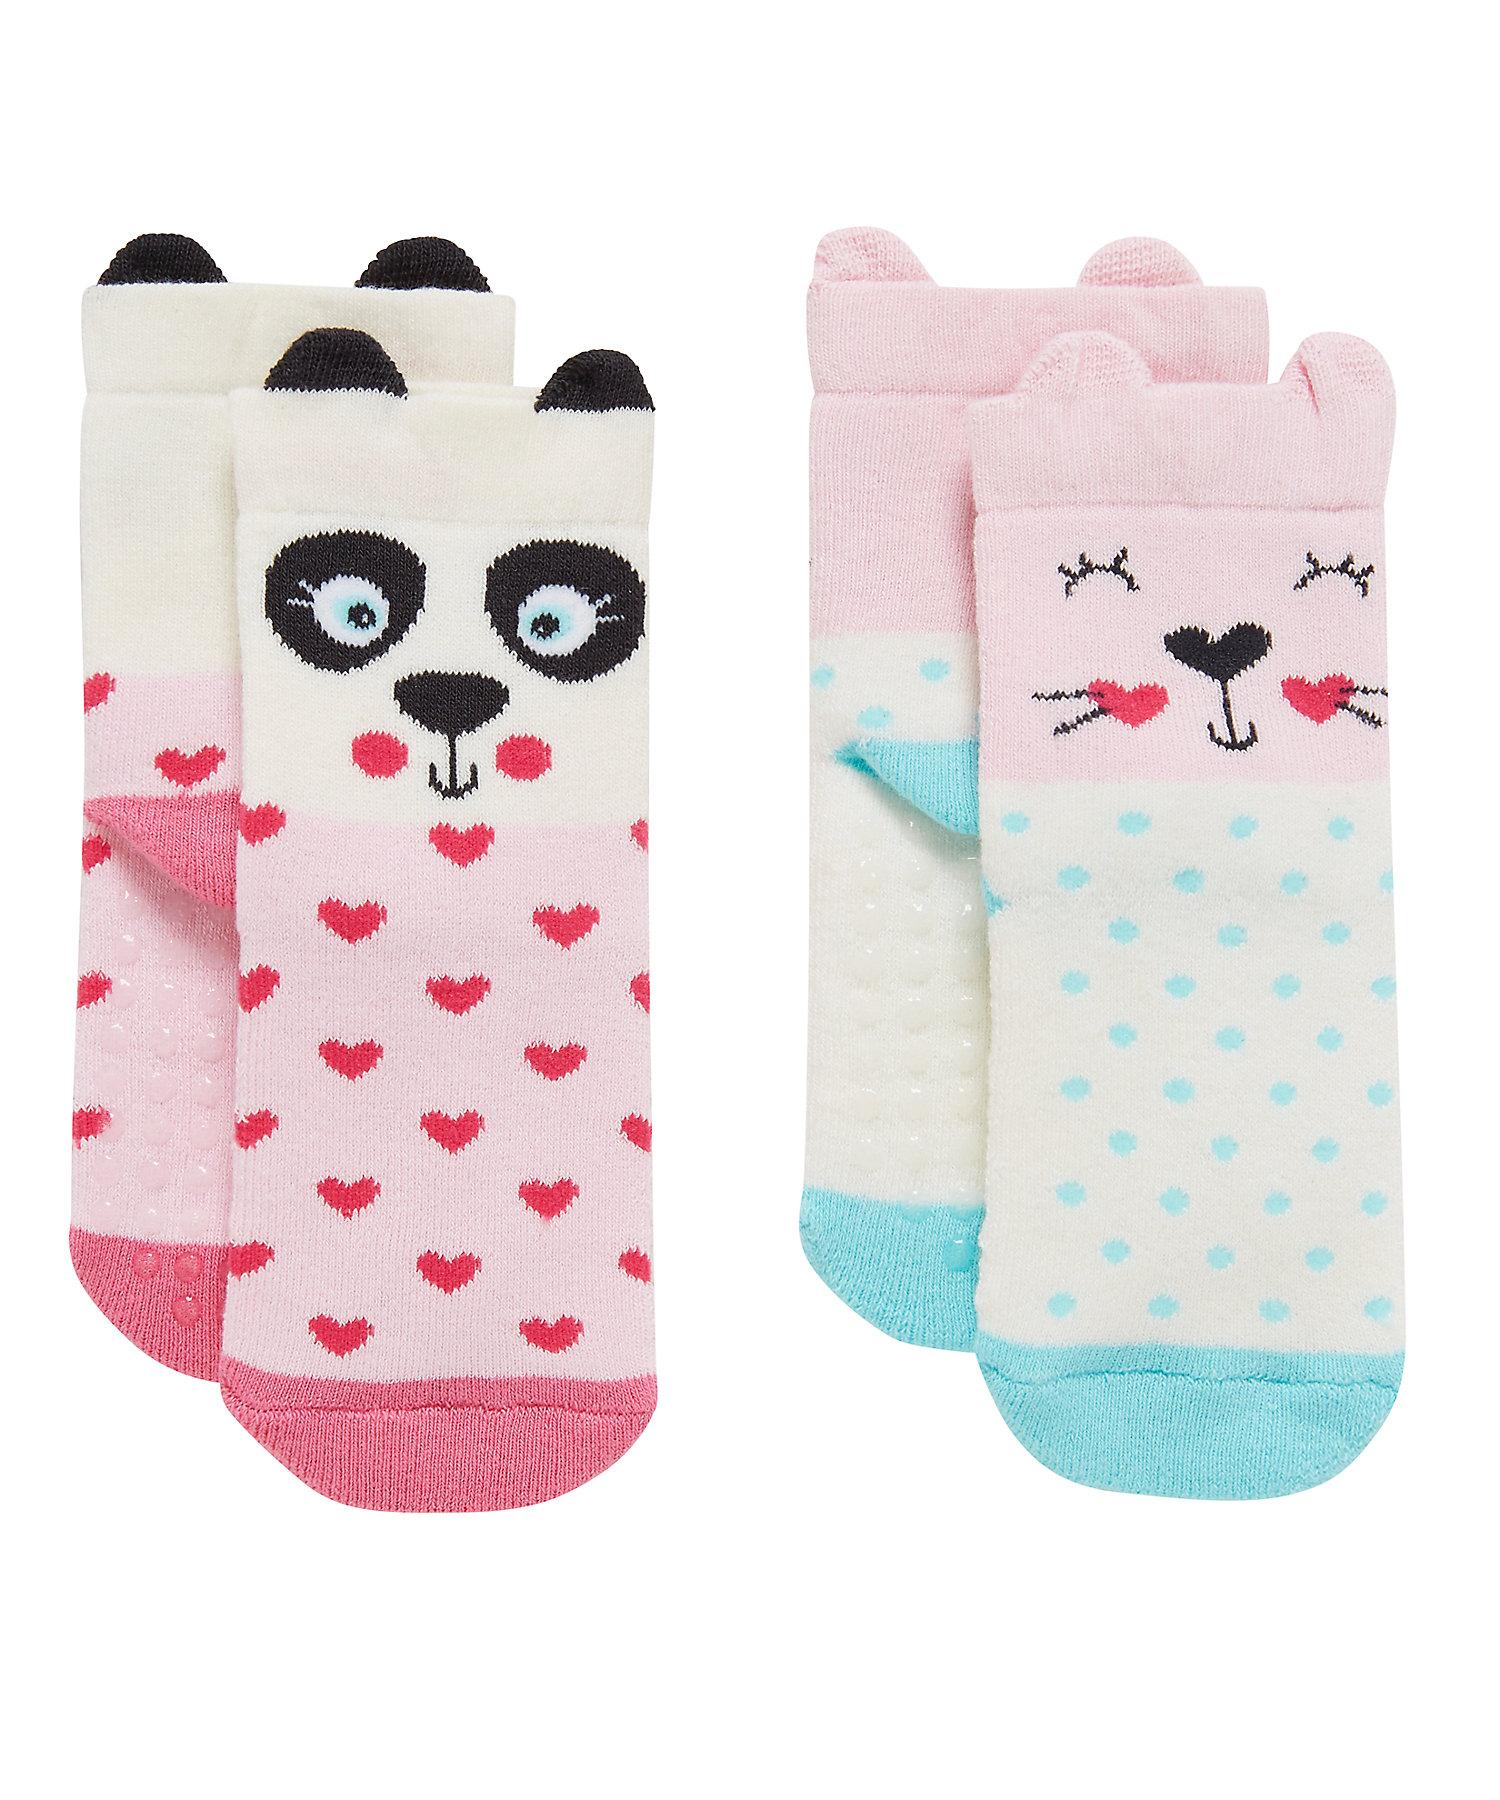 Mothercare | Girls Socks 3D Details - Pack Of 2 - Multicolor